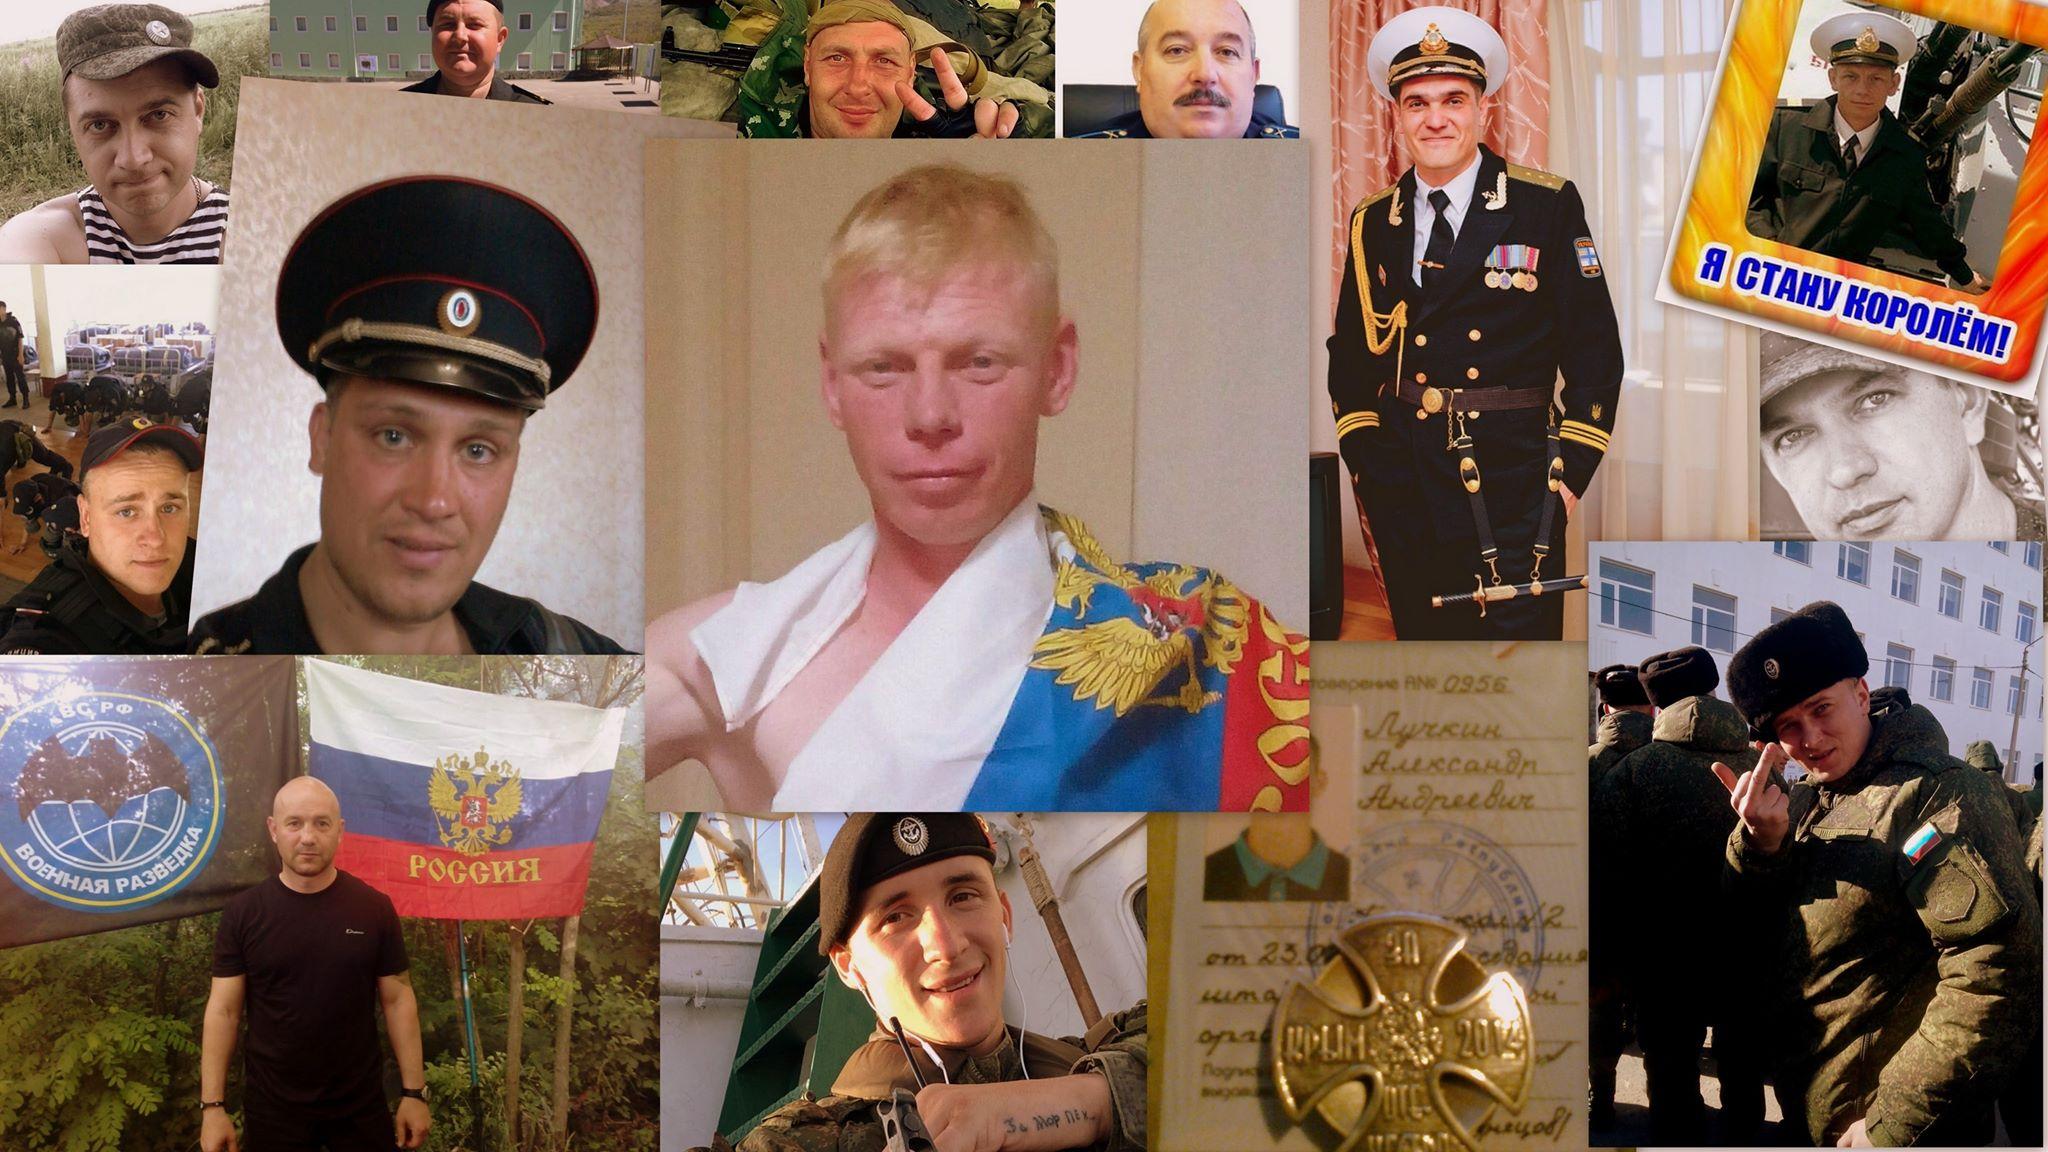 Кримські зрадники – Крымские предатели – Crimean traitors (18 червня)